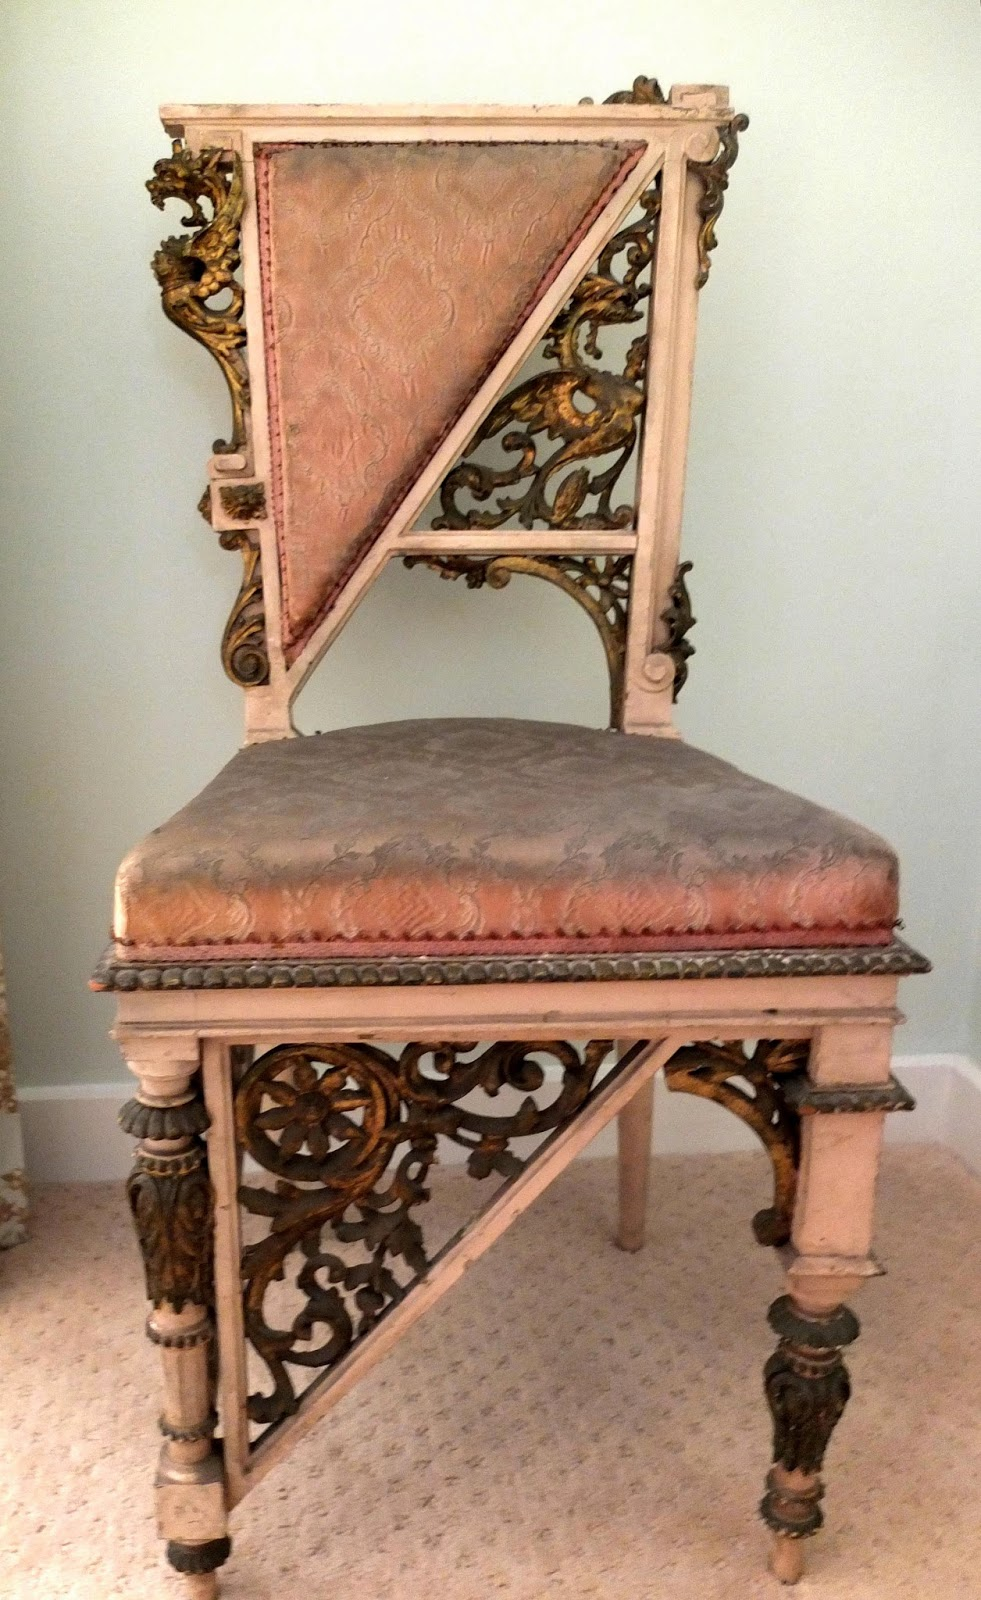 Antique Style: Unusual Chairs - Antique Italian Aesthetic ...